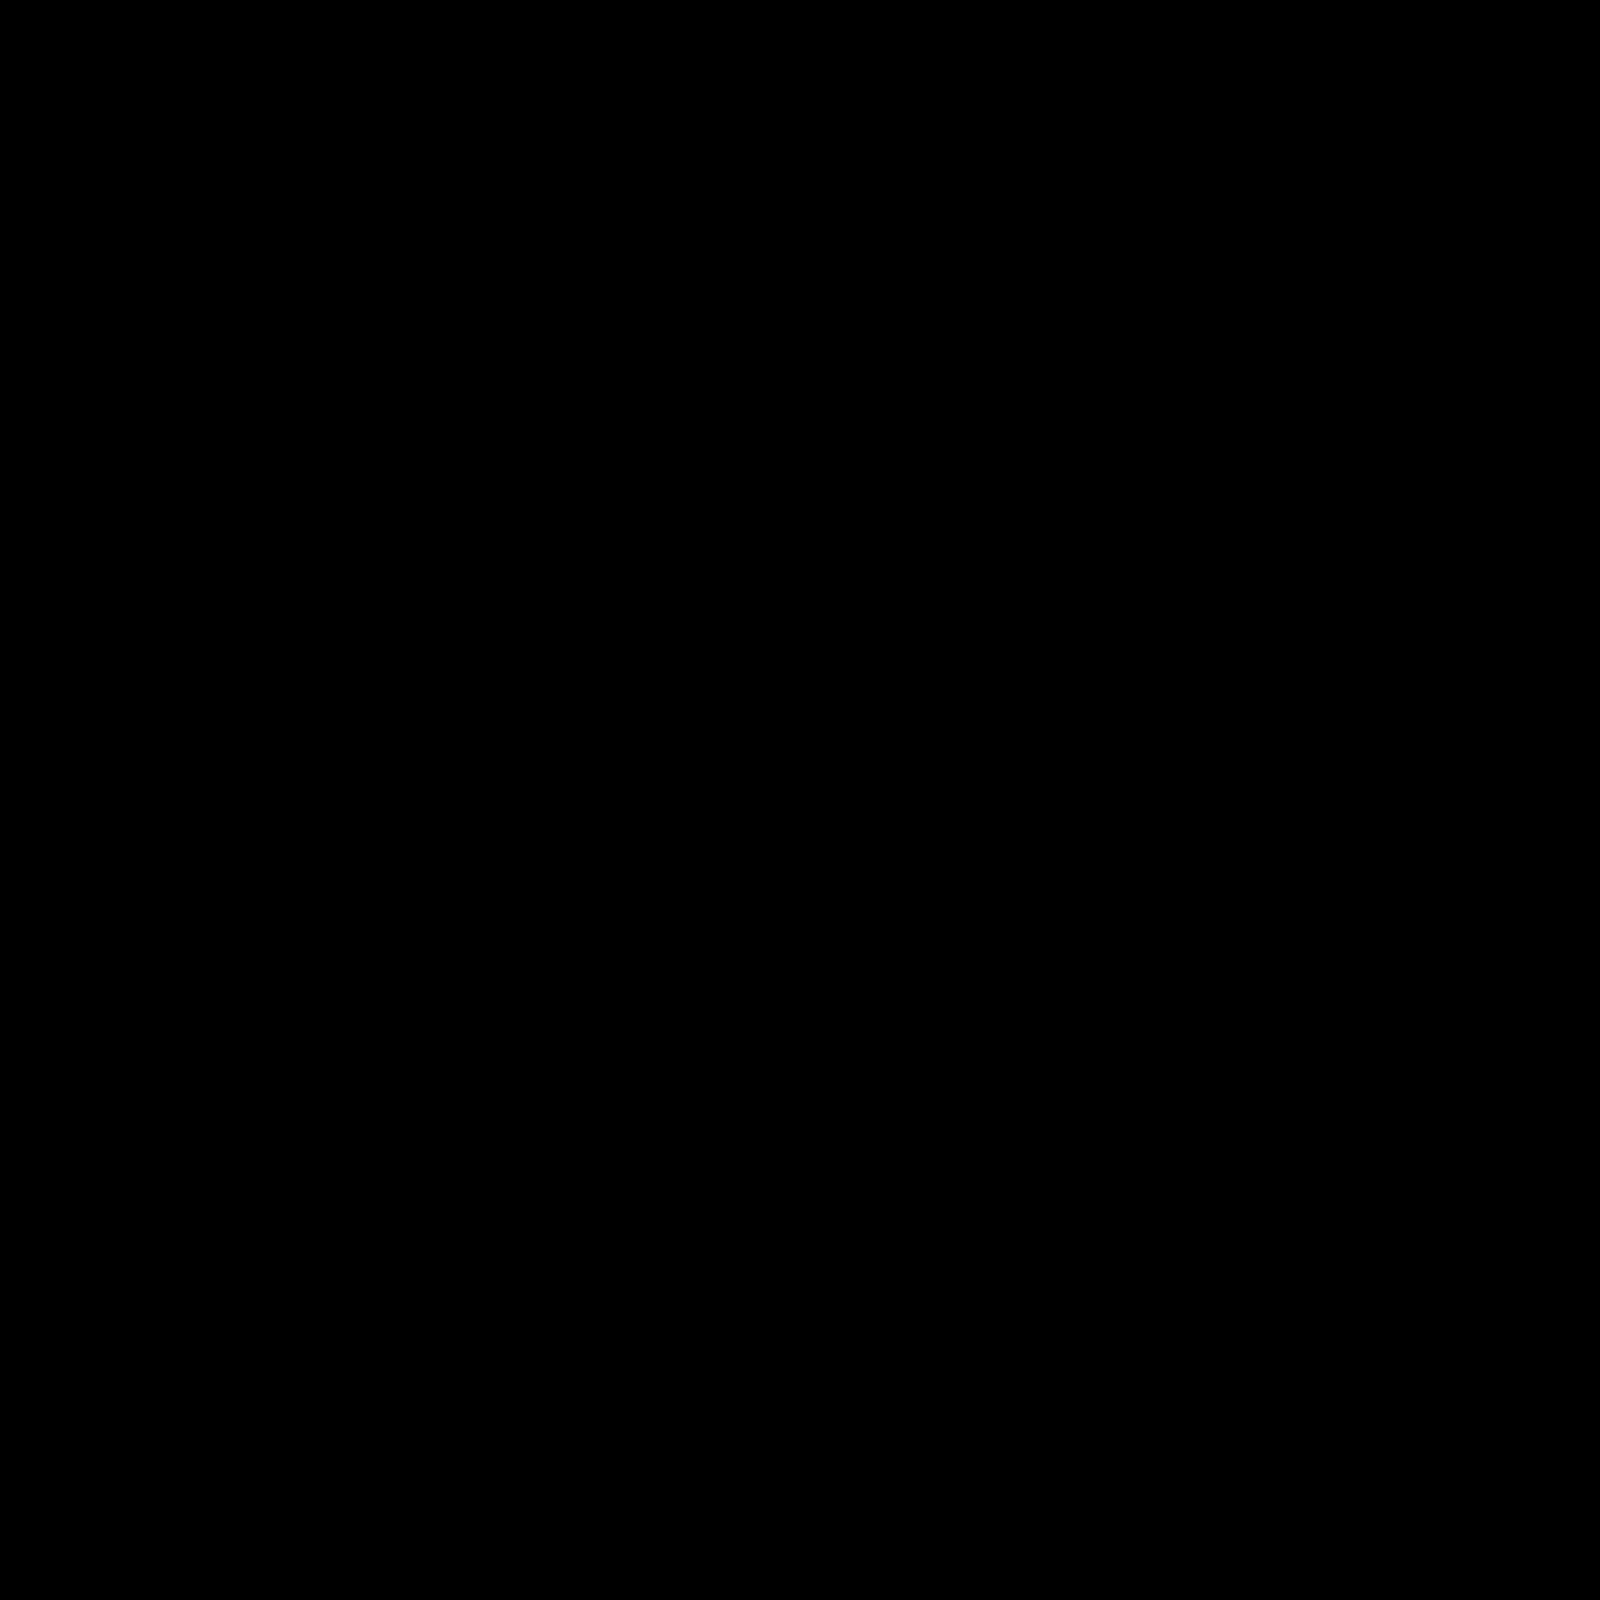 VK.com Filled icon